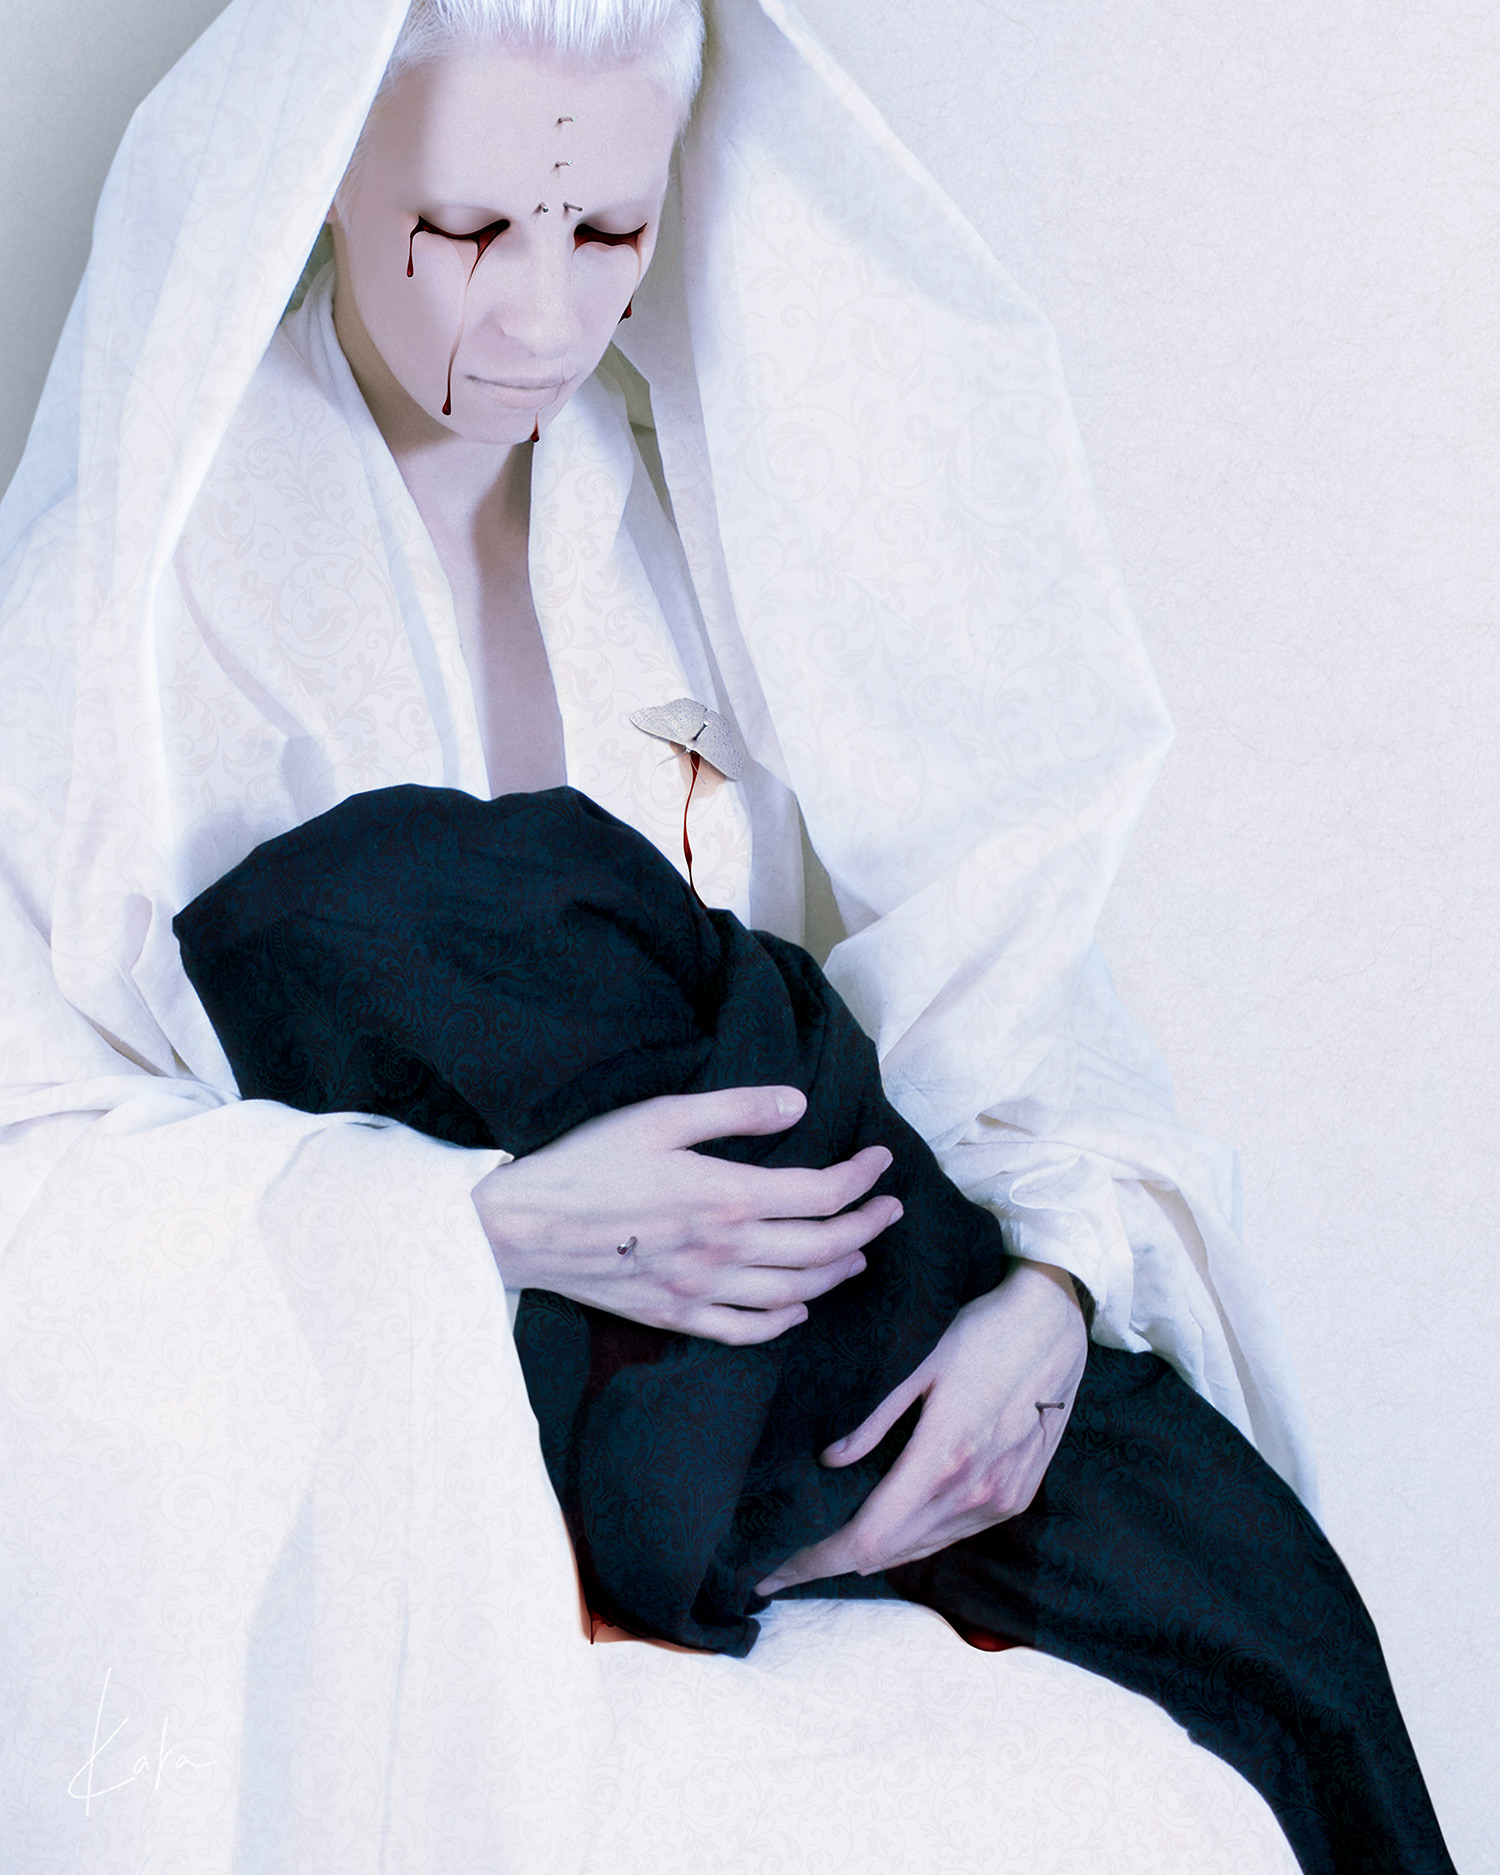 Karina Marandjian - My Pain